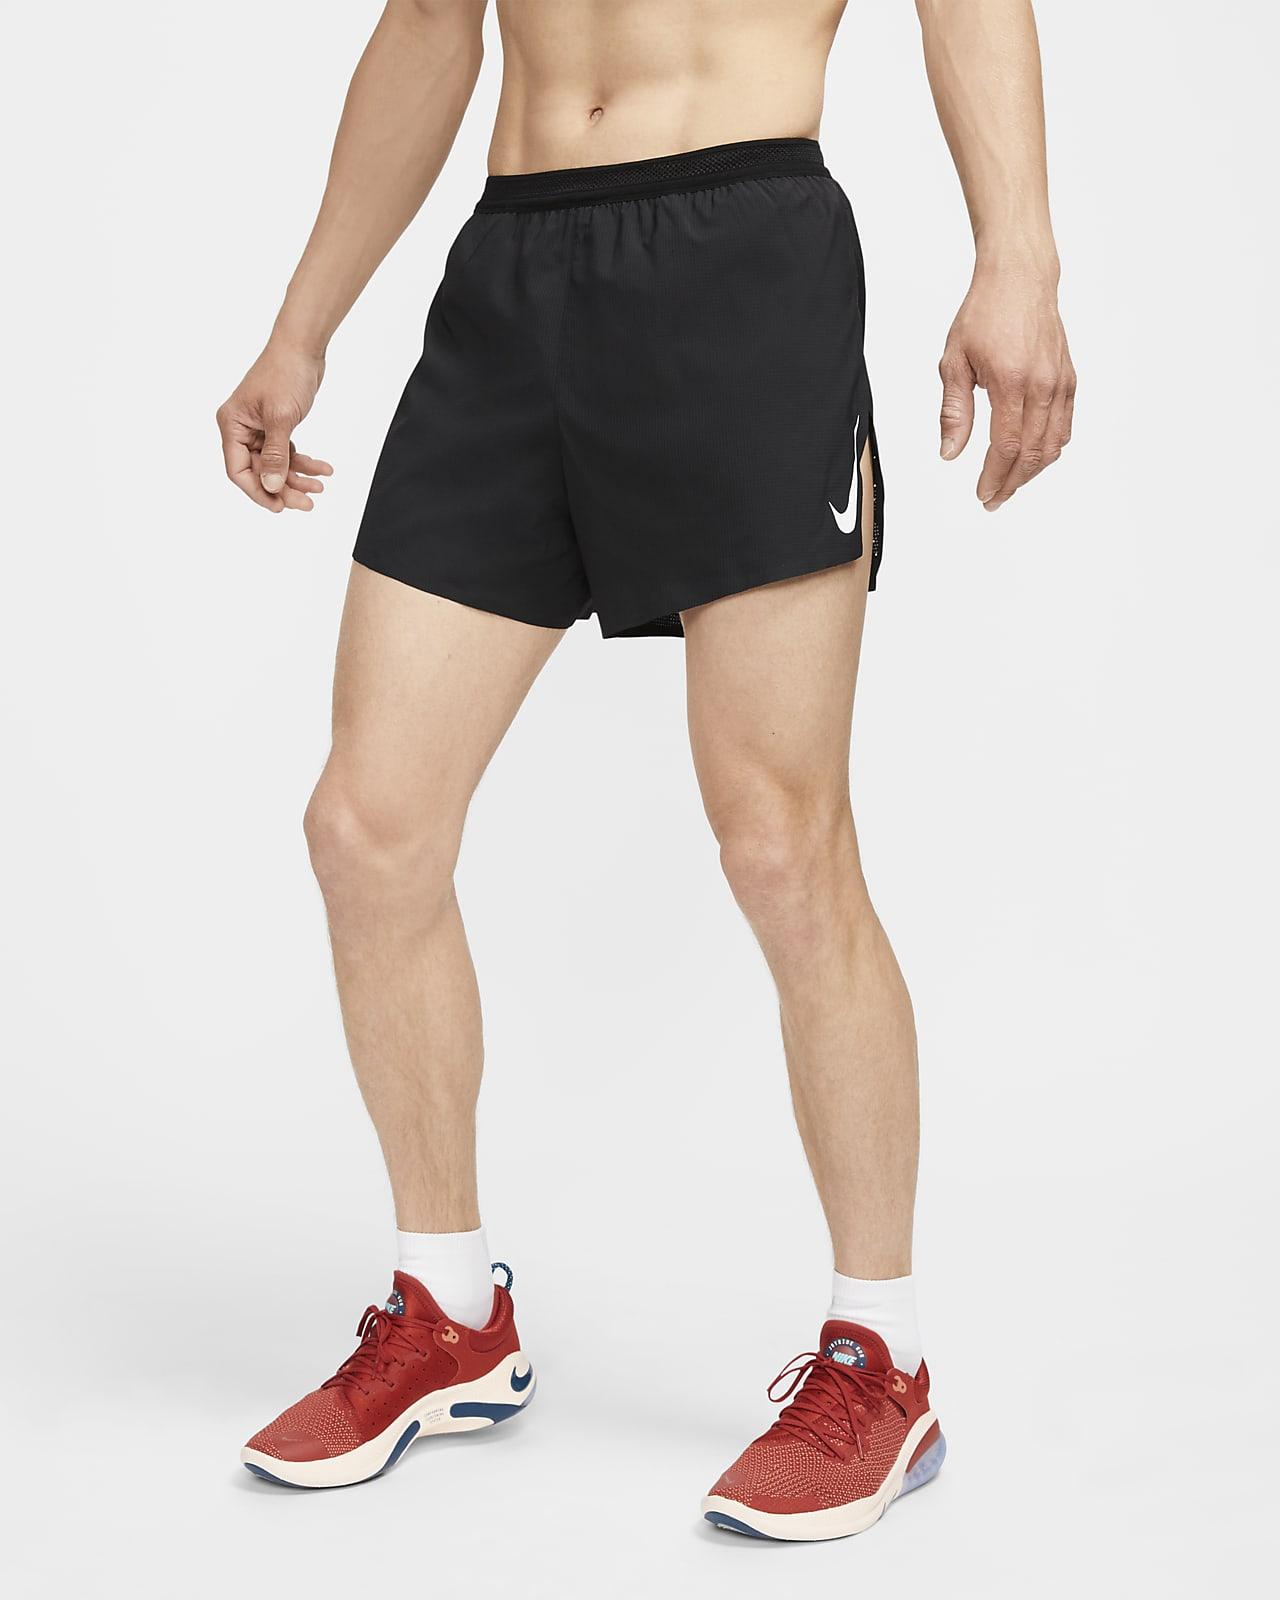 Shorts de running de tiro de 10 cm para hombre Nike AeroSwift